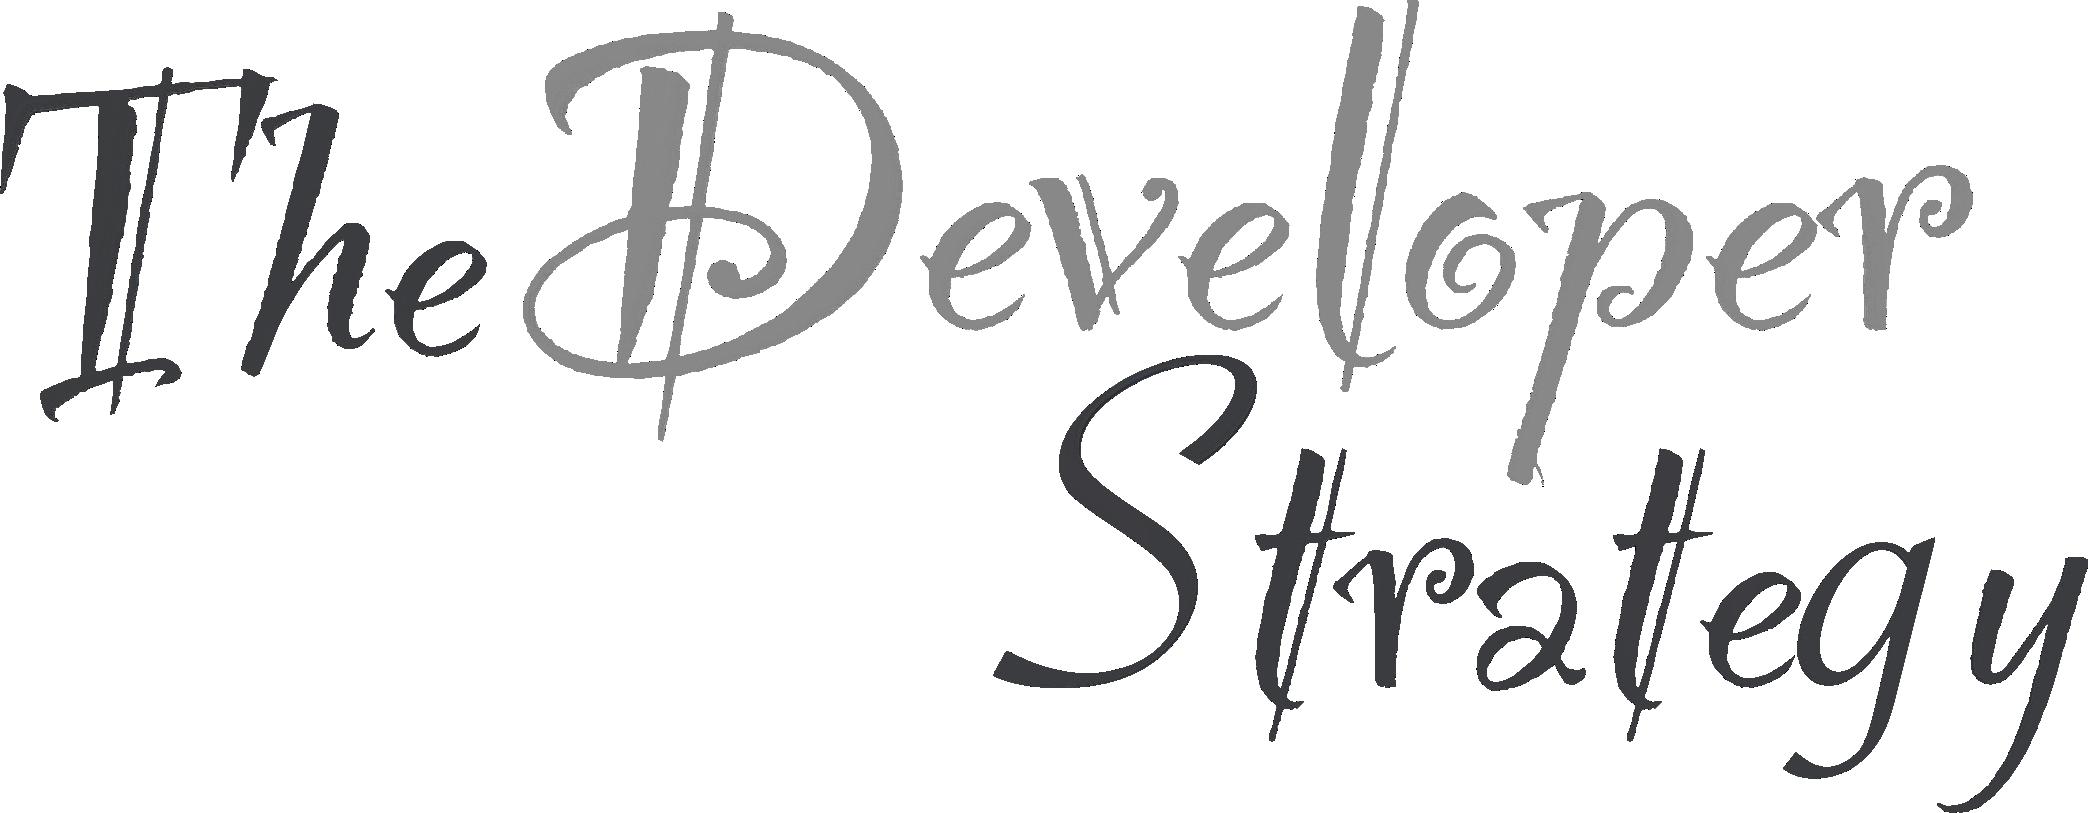 Dev Strategy Titles v2.png